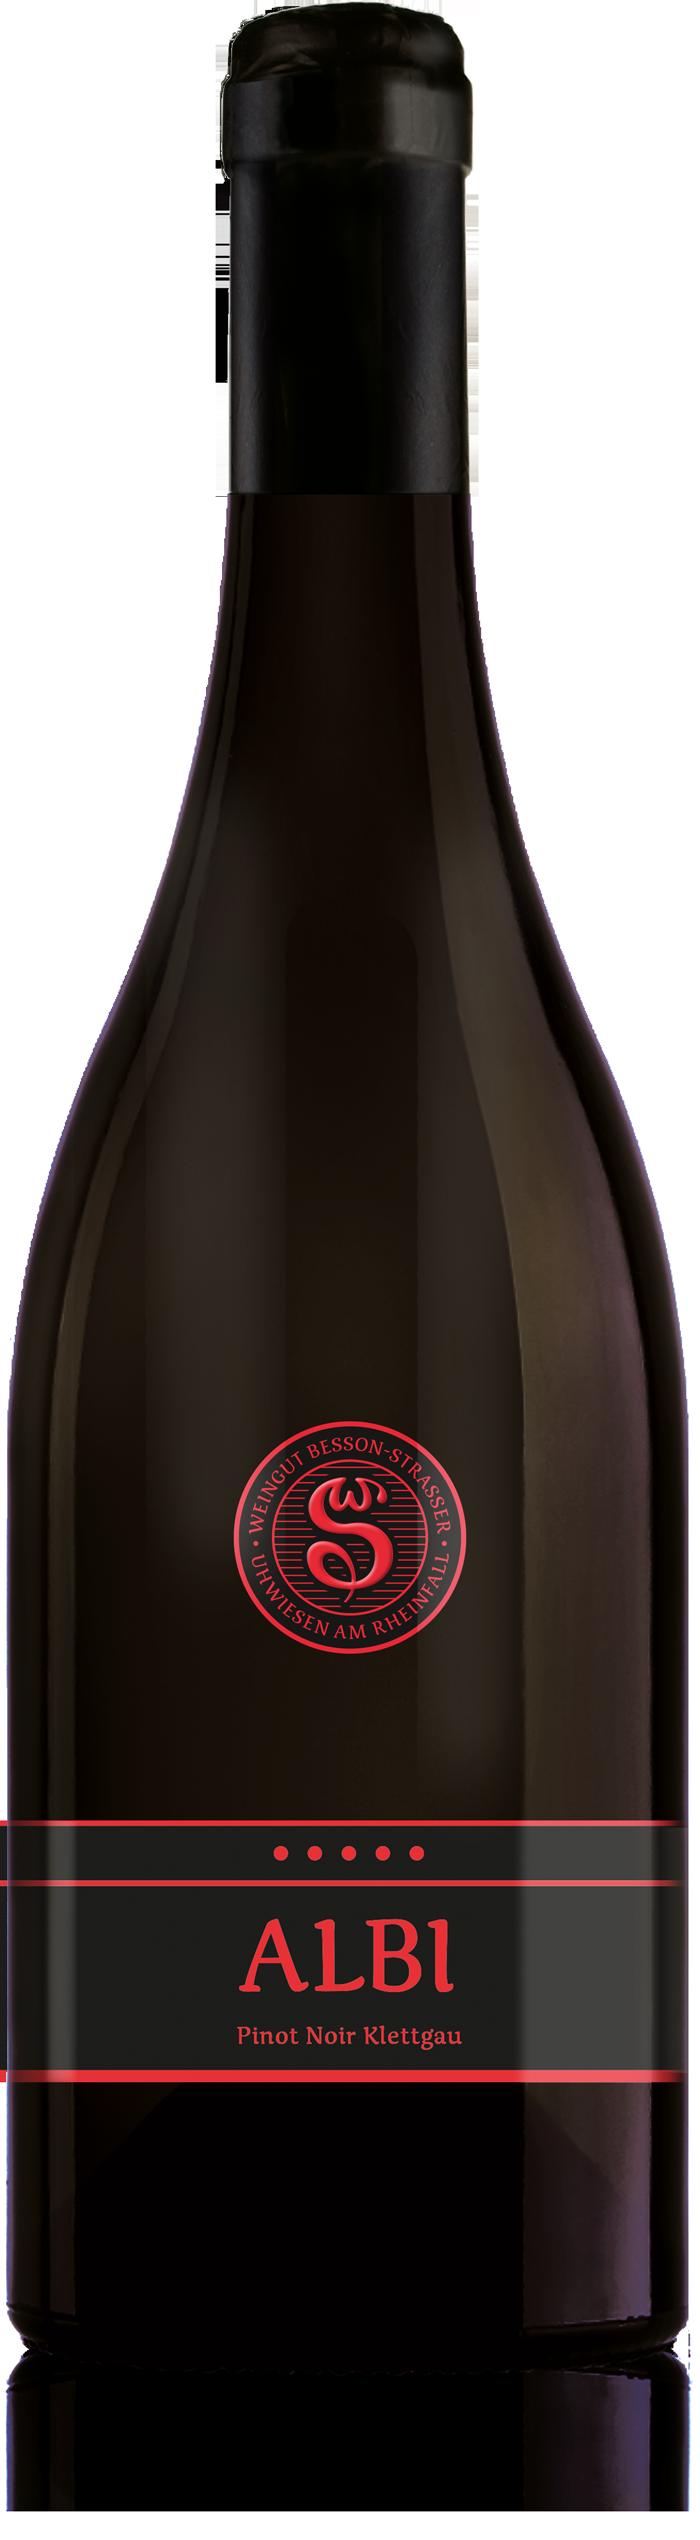 ALBI Pinot Noir Klettgau 2017